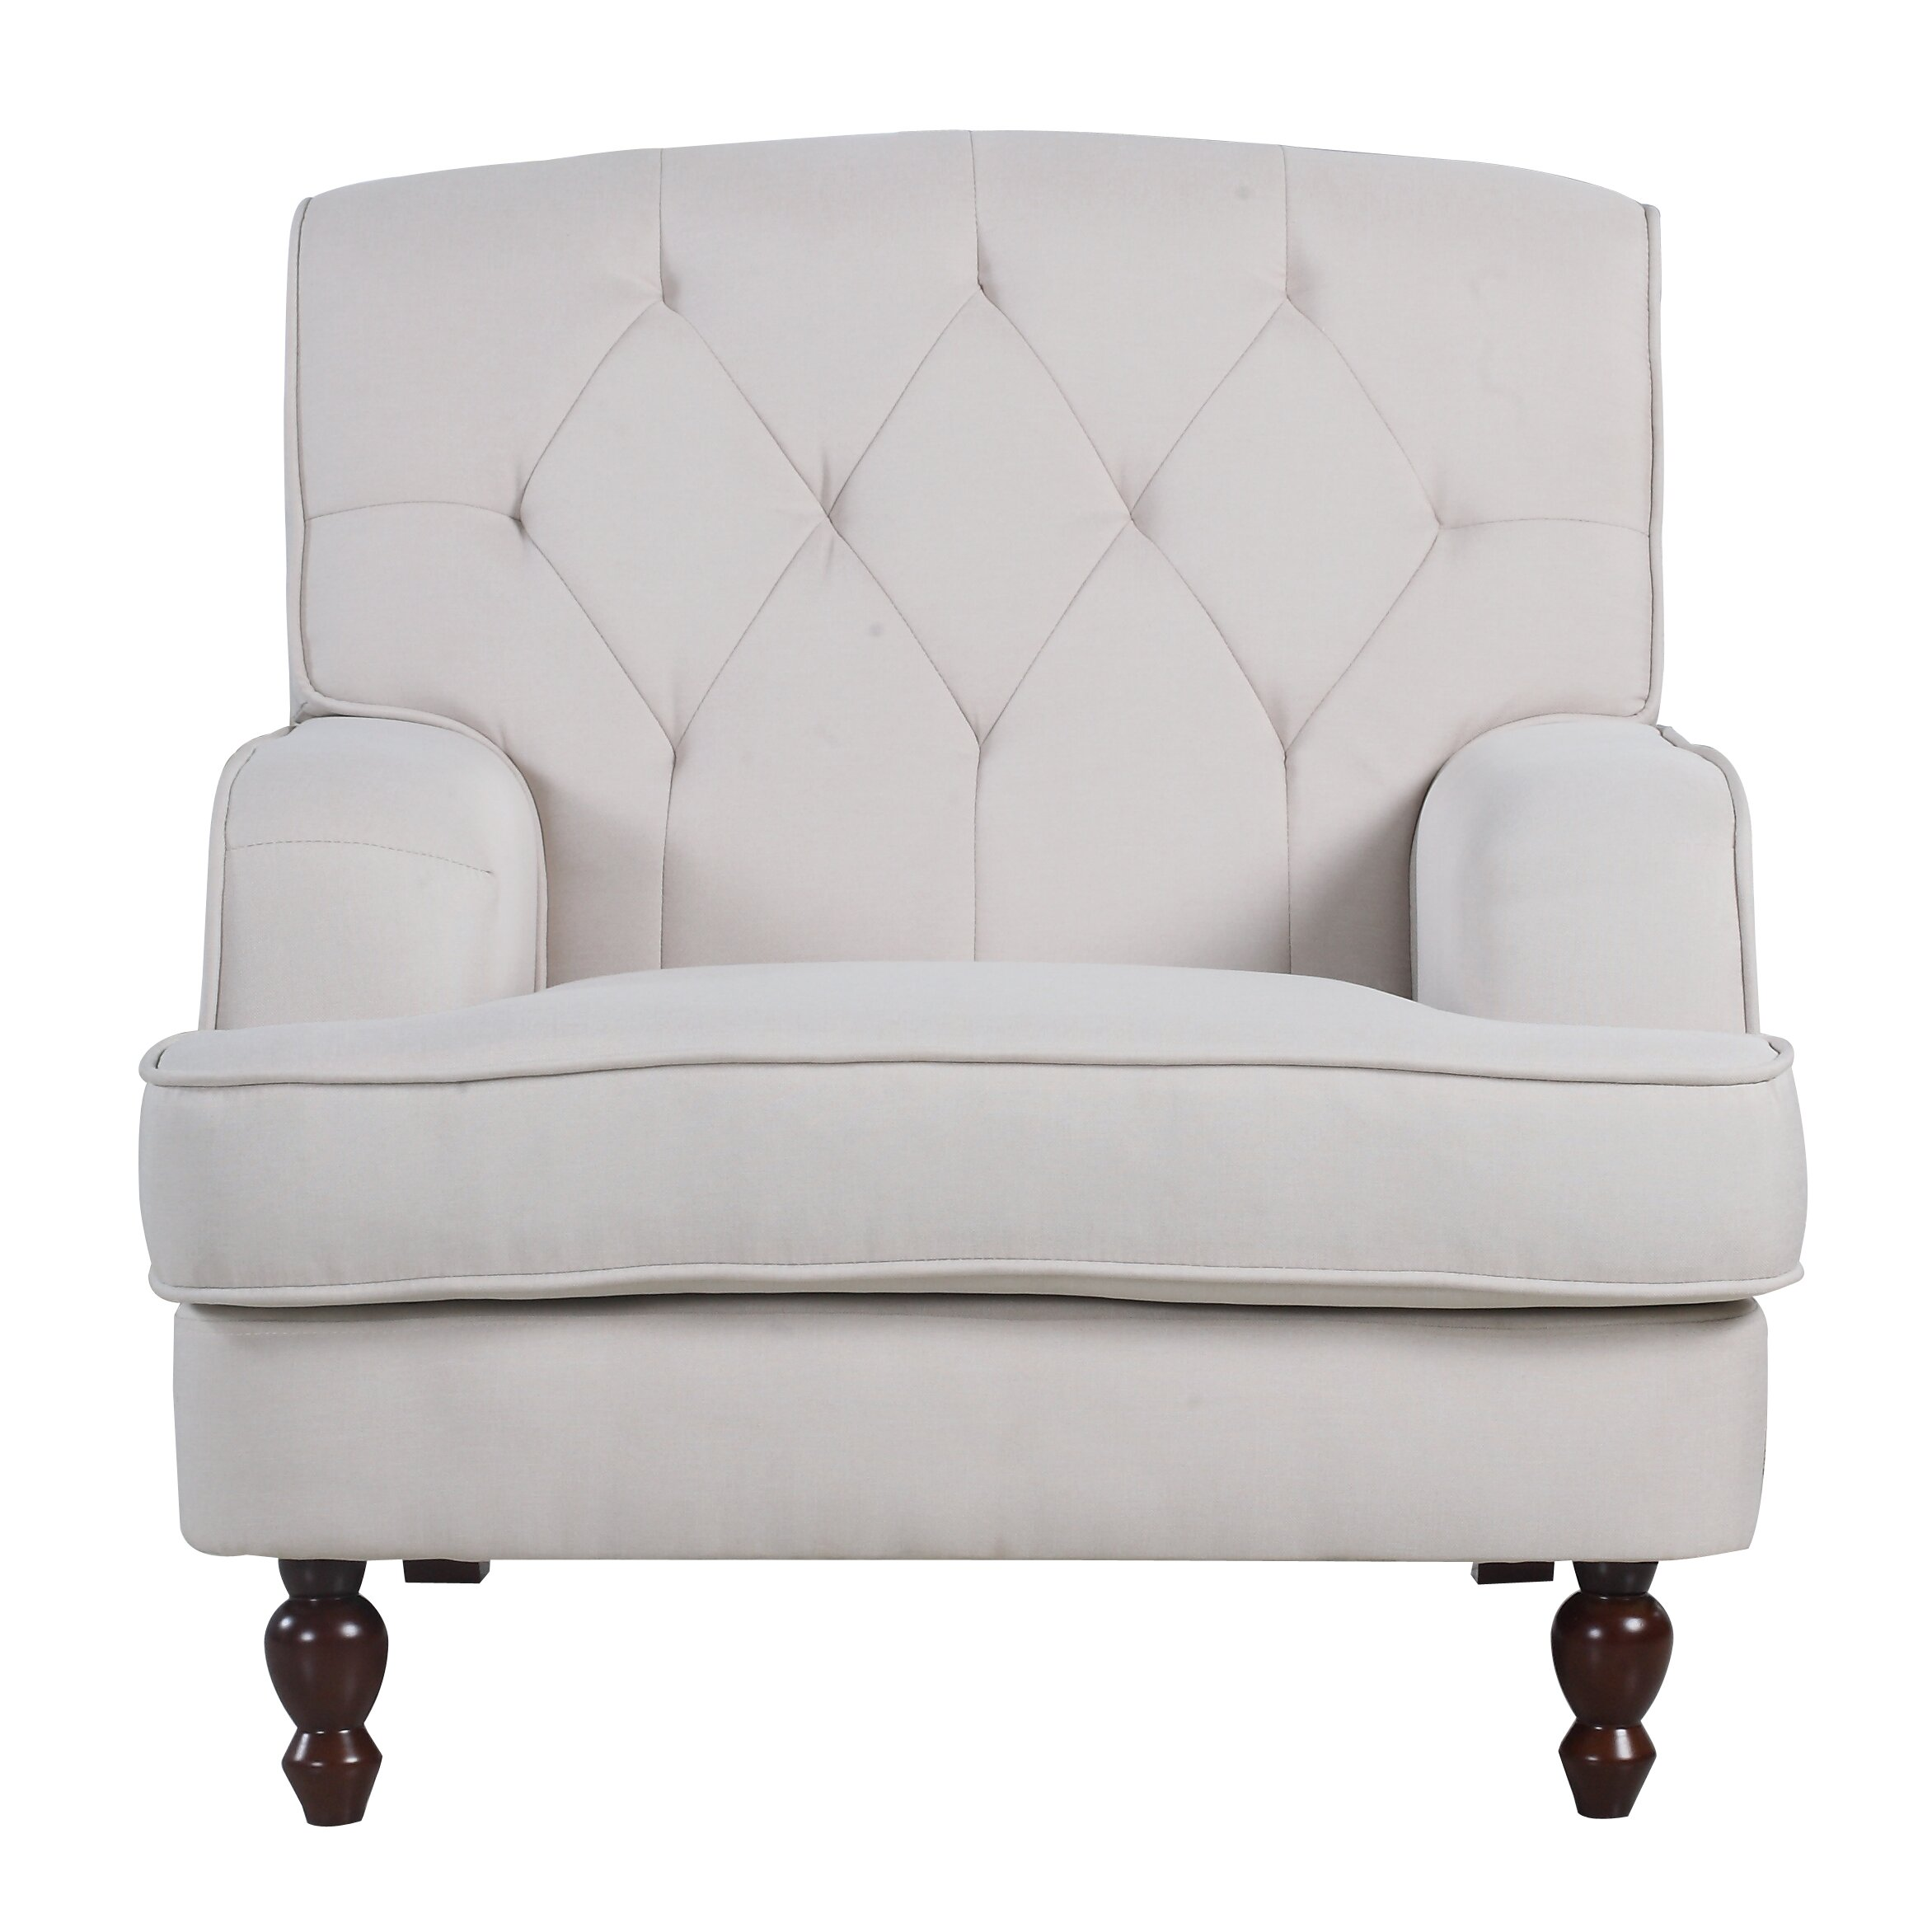 Tufted Living Room Chair Madison Home Usa Modern Tufted Fabric Living Room Arm Chair